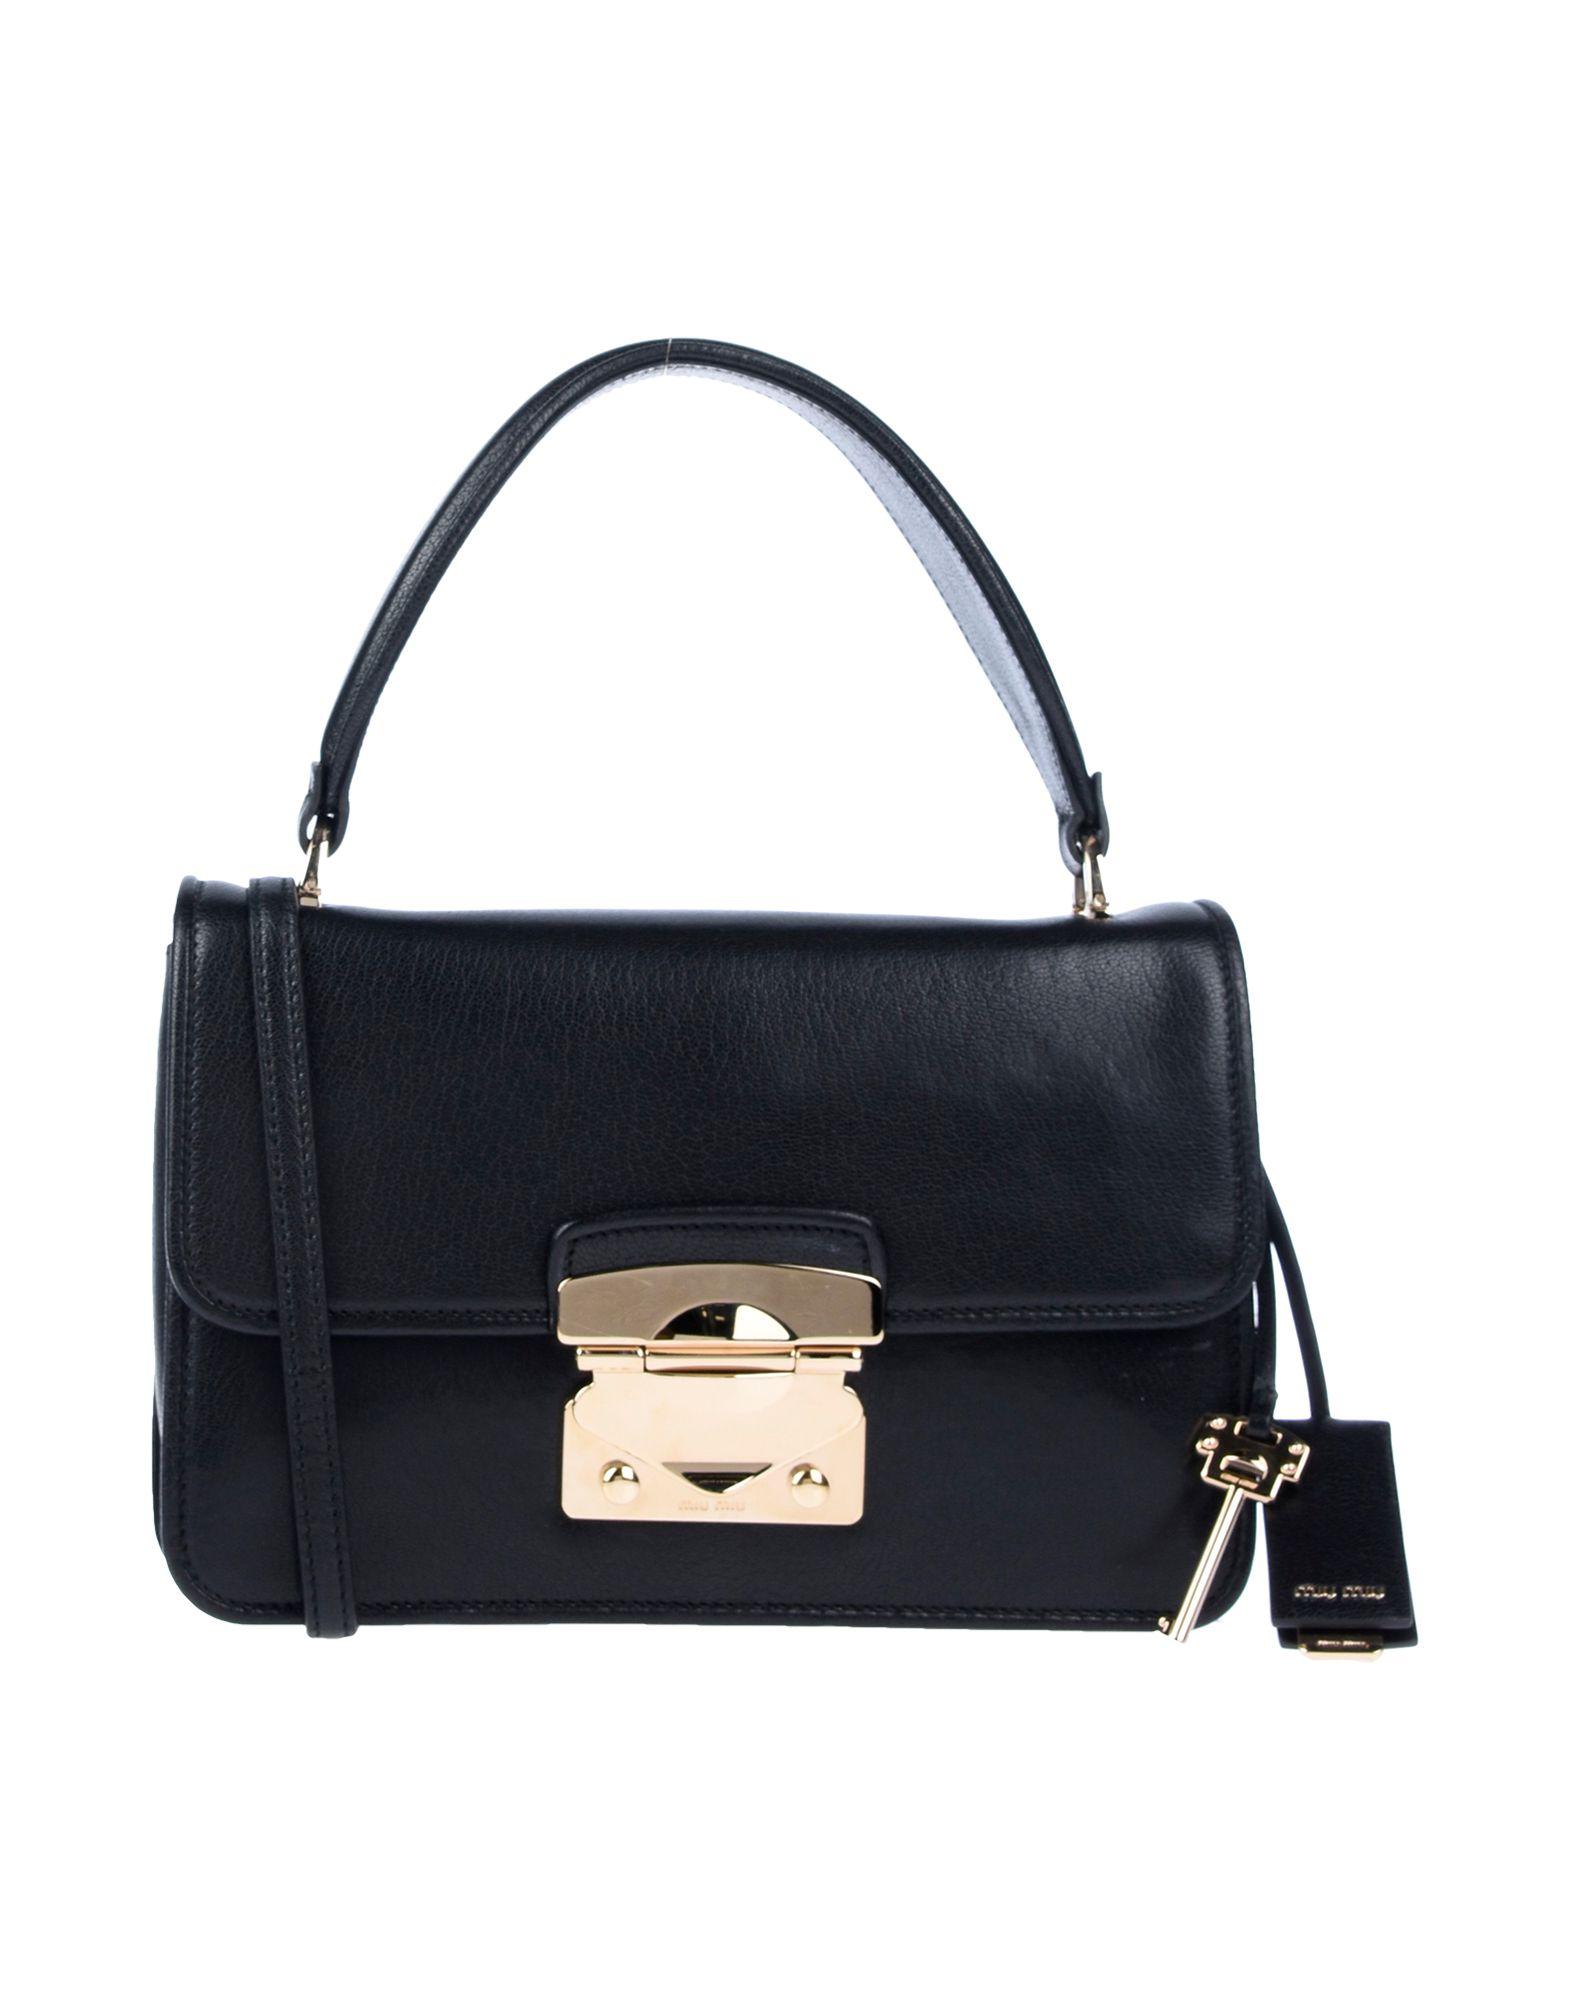 MIU MIU Сумка на руку сумка miu miu p00126898 miumiu 2015